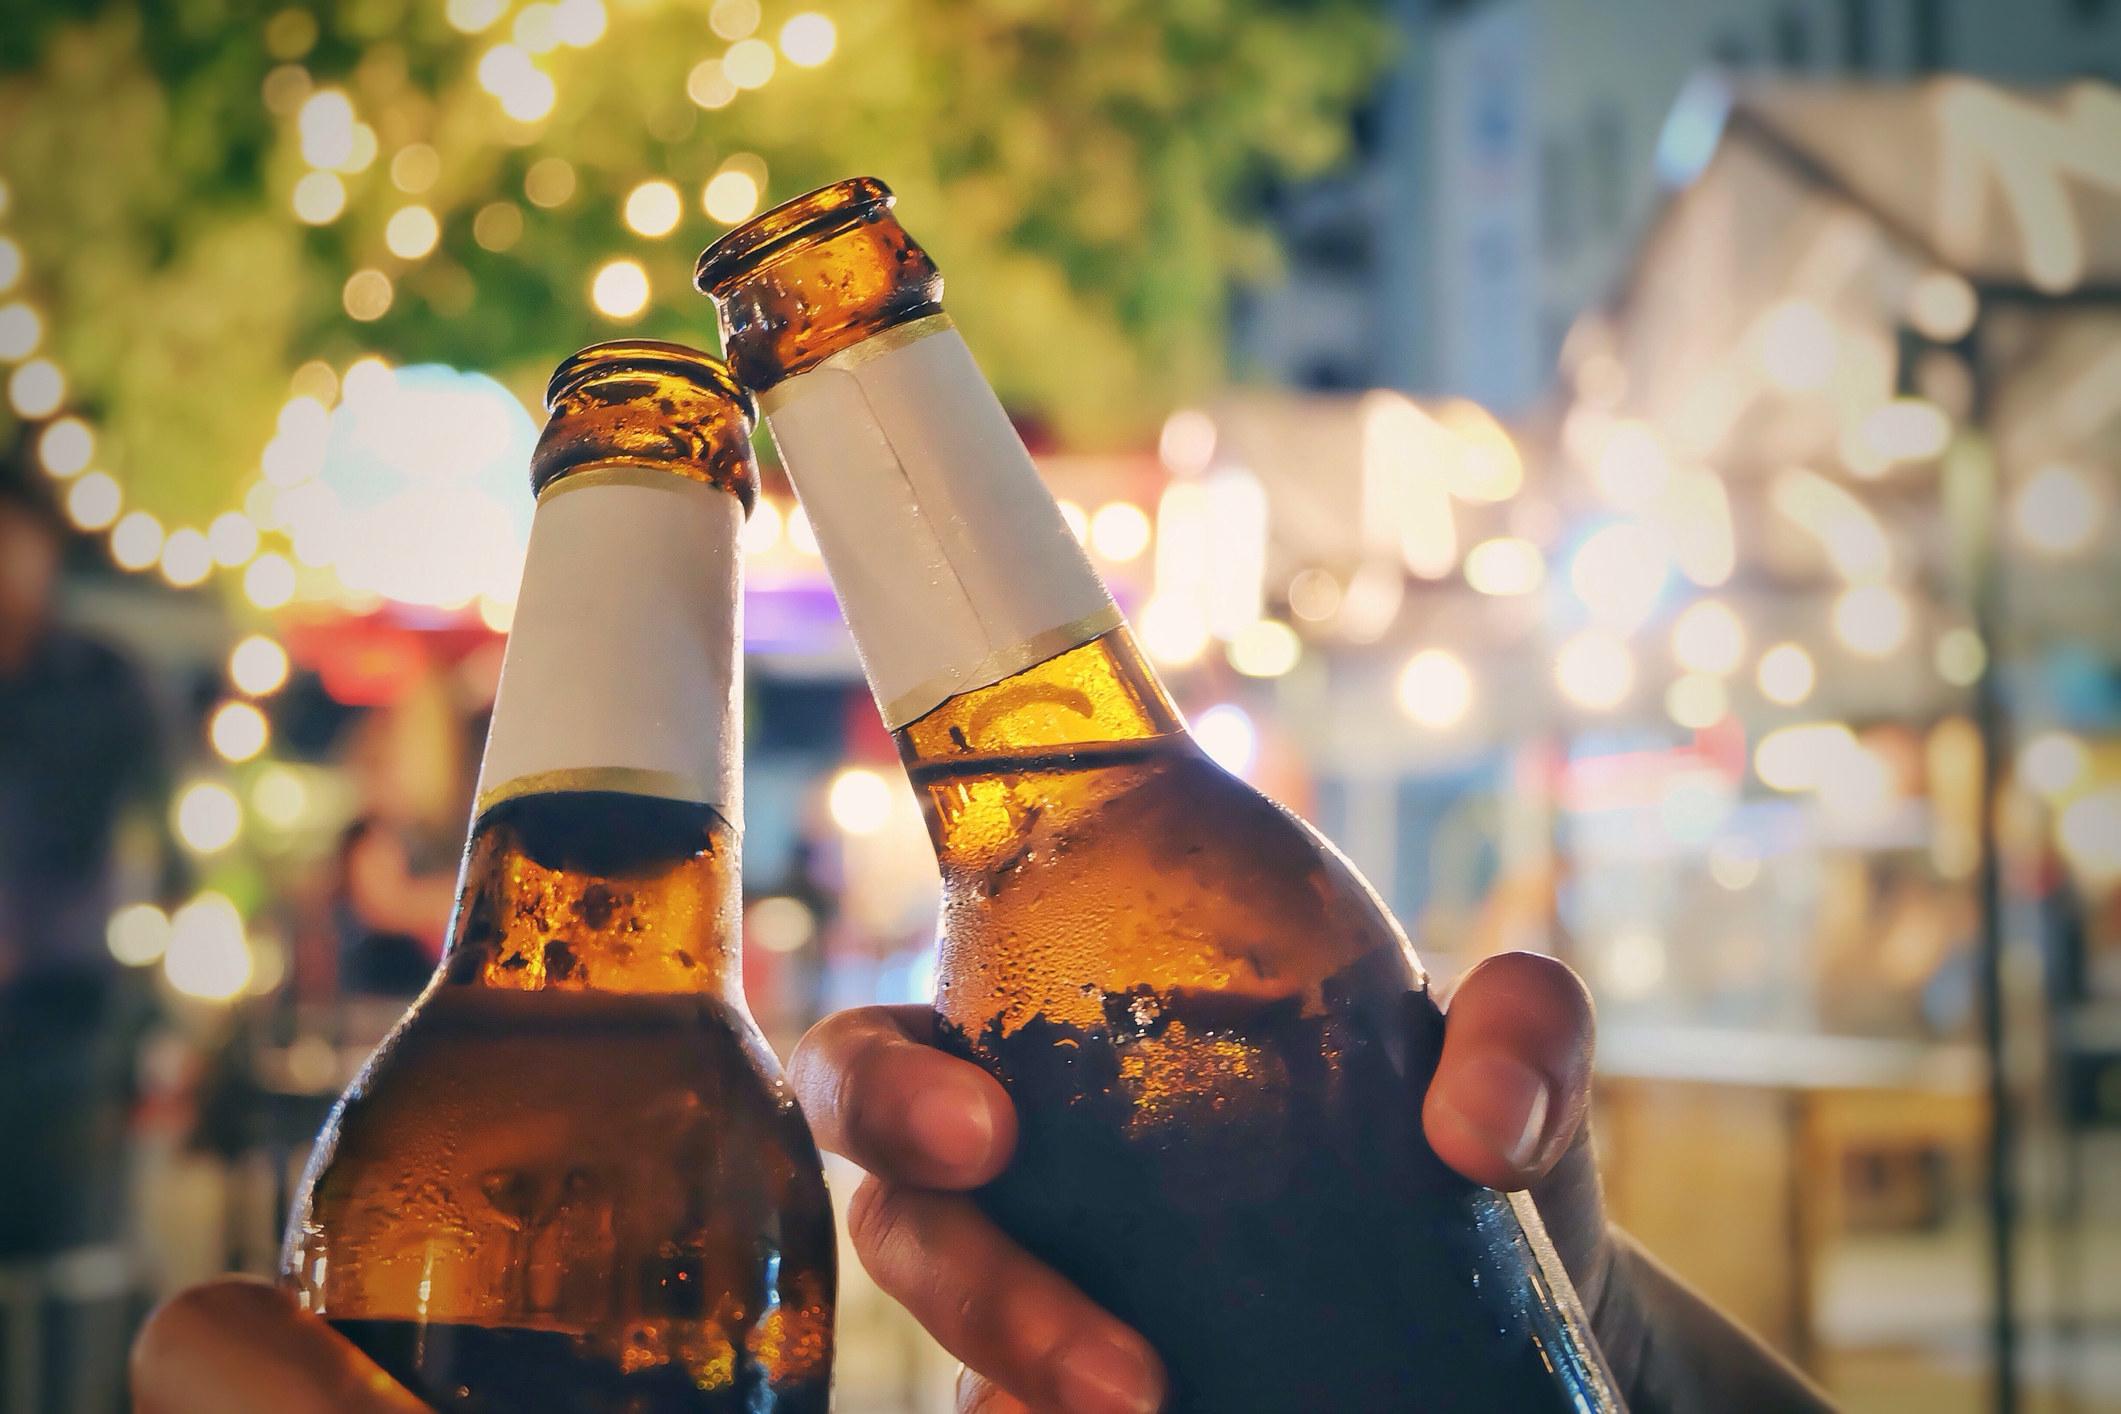 Two beer bottles getting clinked together